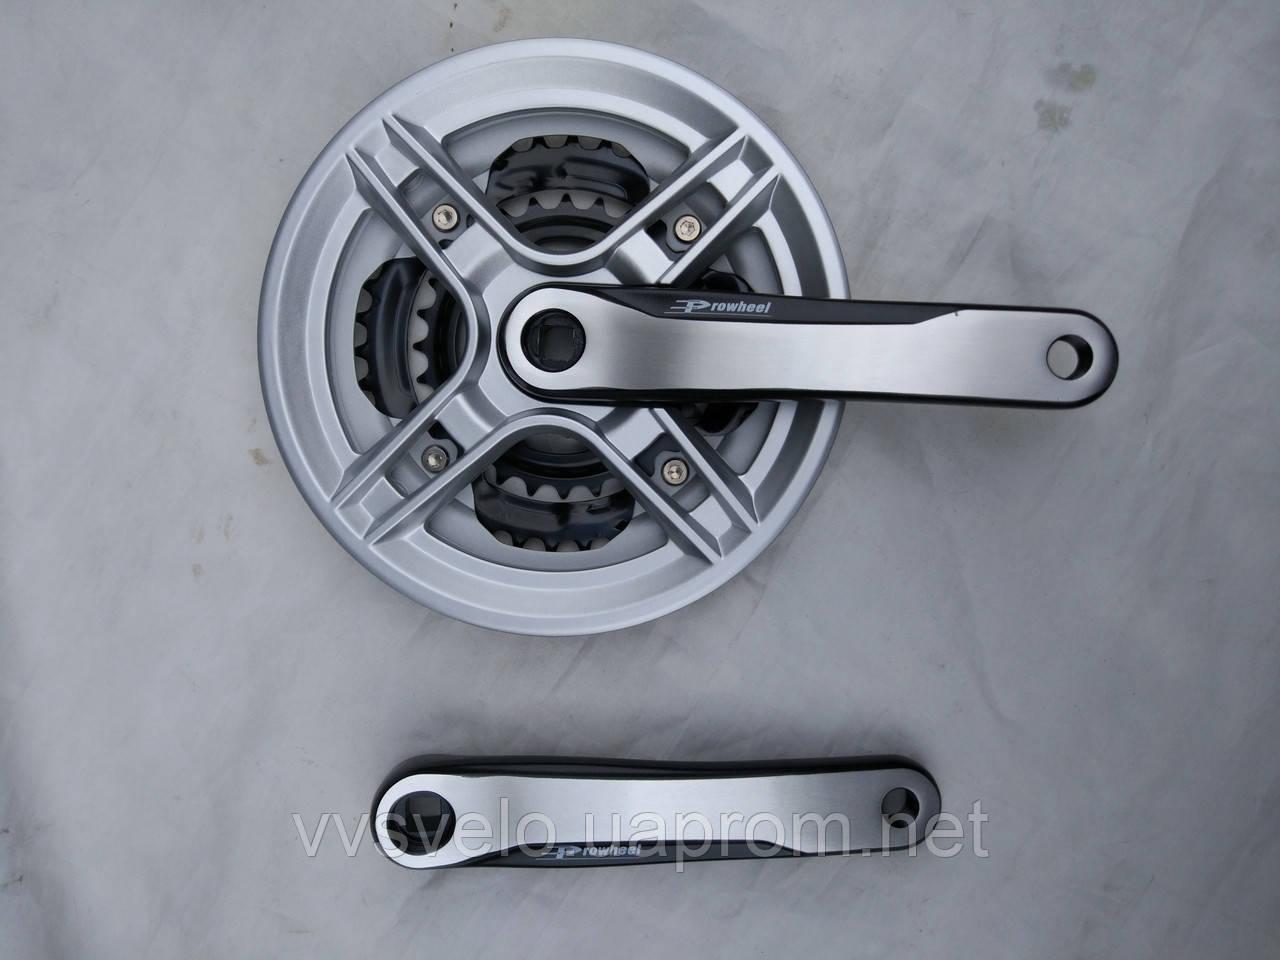 Комплект шатунов prowheel 48/38/28 170 mm серебро фрезерованный 2017